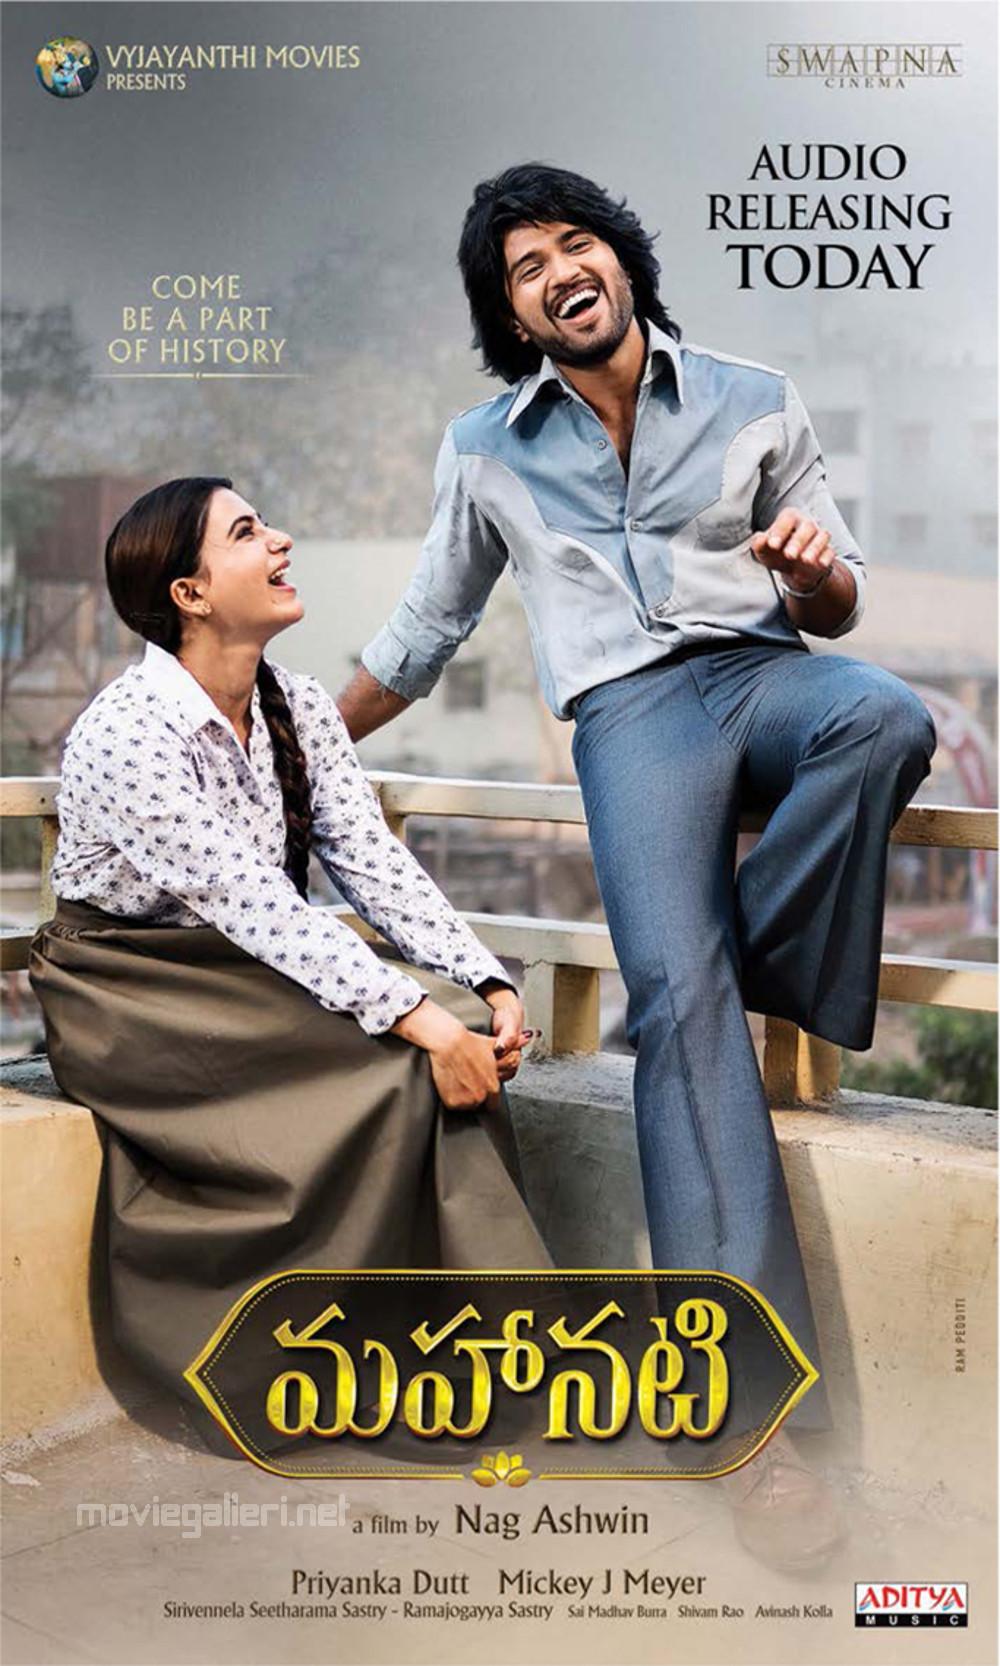 Samantha Akkineni Vijay Devarakonda Mahanati Movie Audio Releasing Today Posters